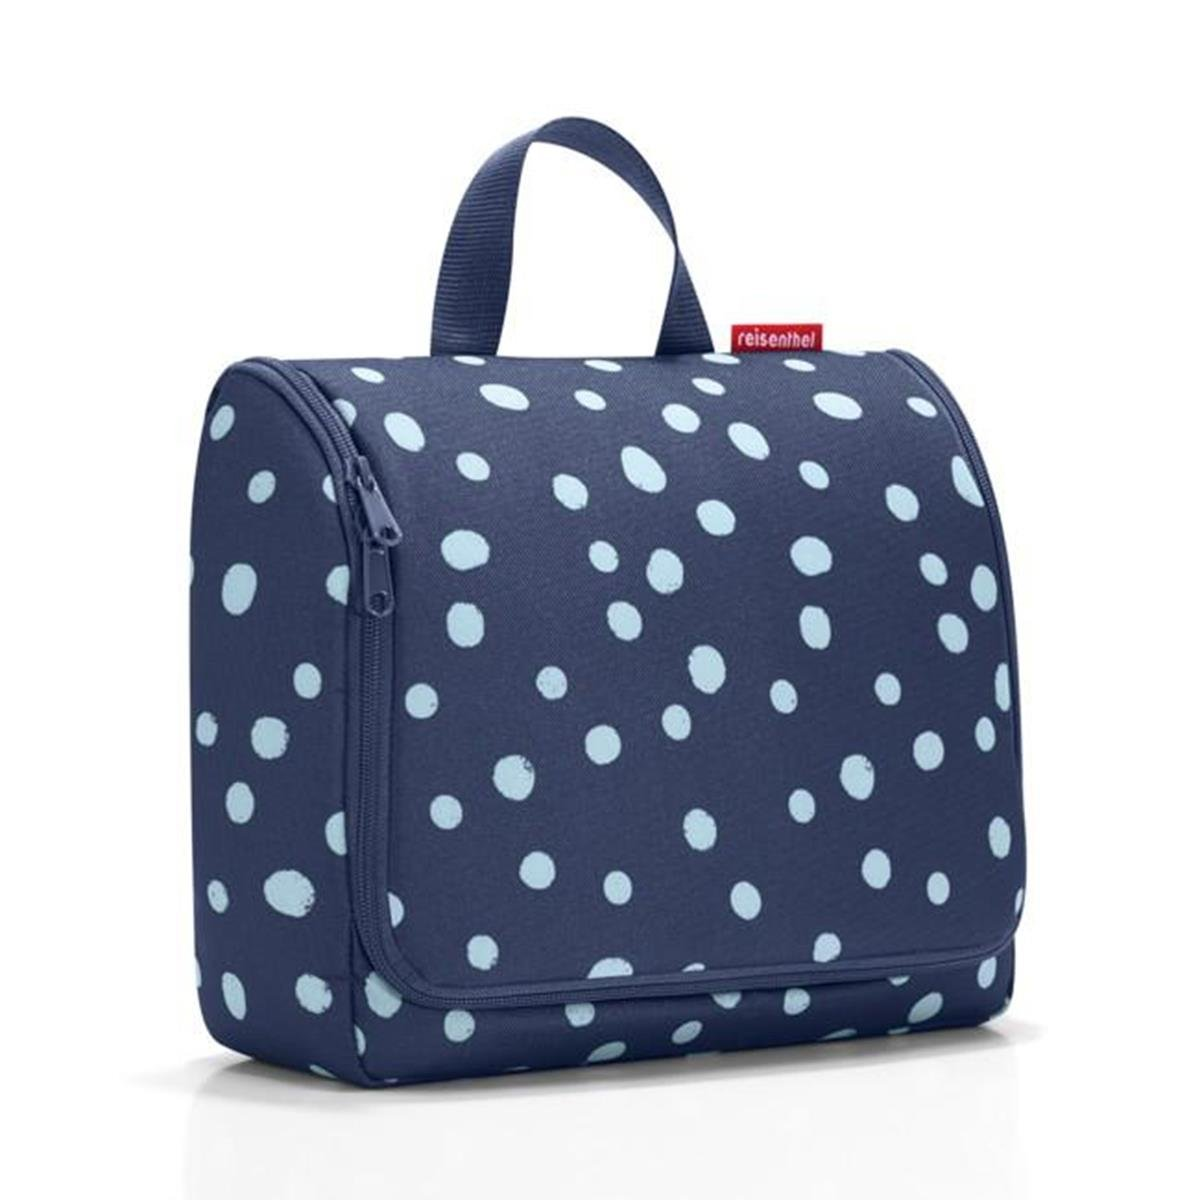 Reisenthel toiletbag Neceser, 28 cm, 4 liters, Azul (Spots Navy) WO4044